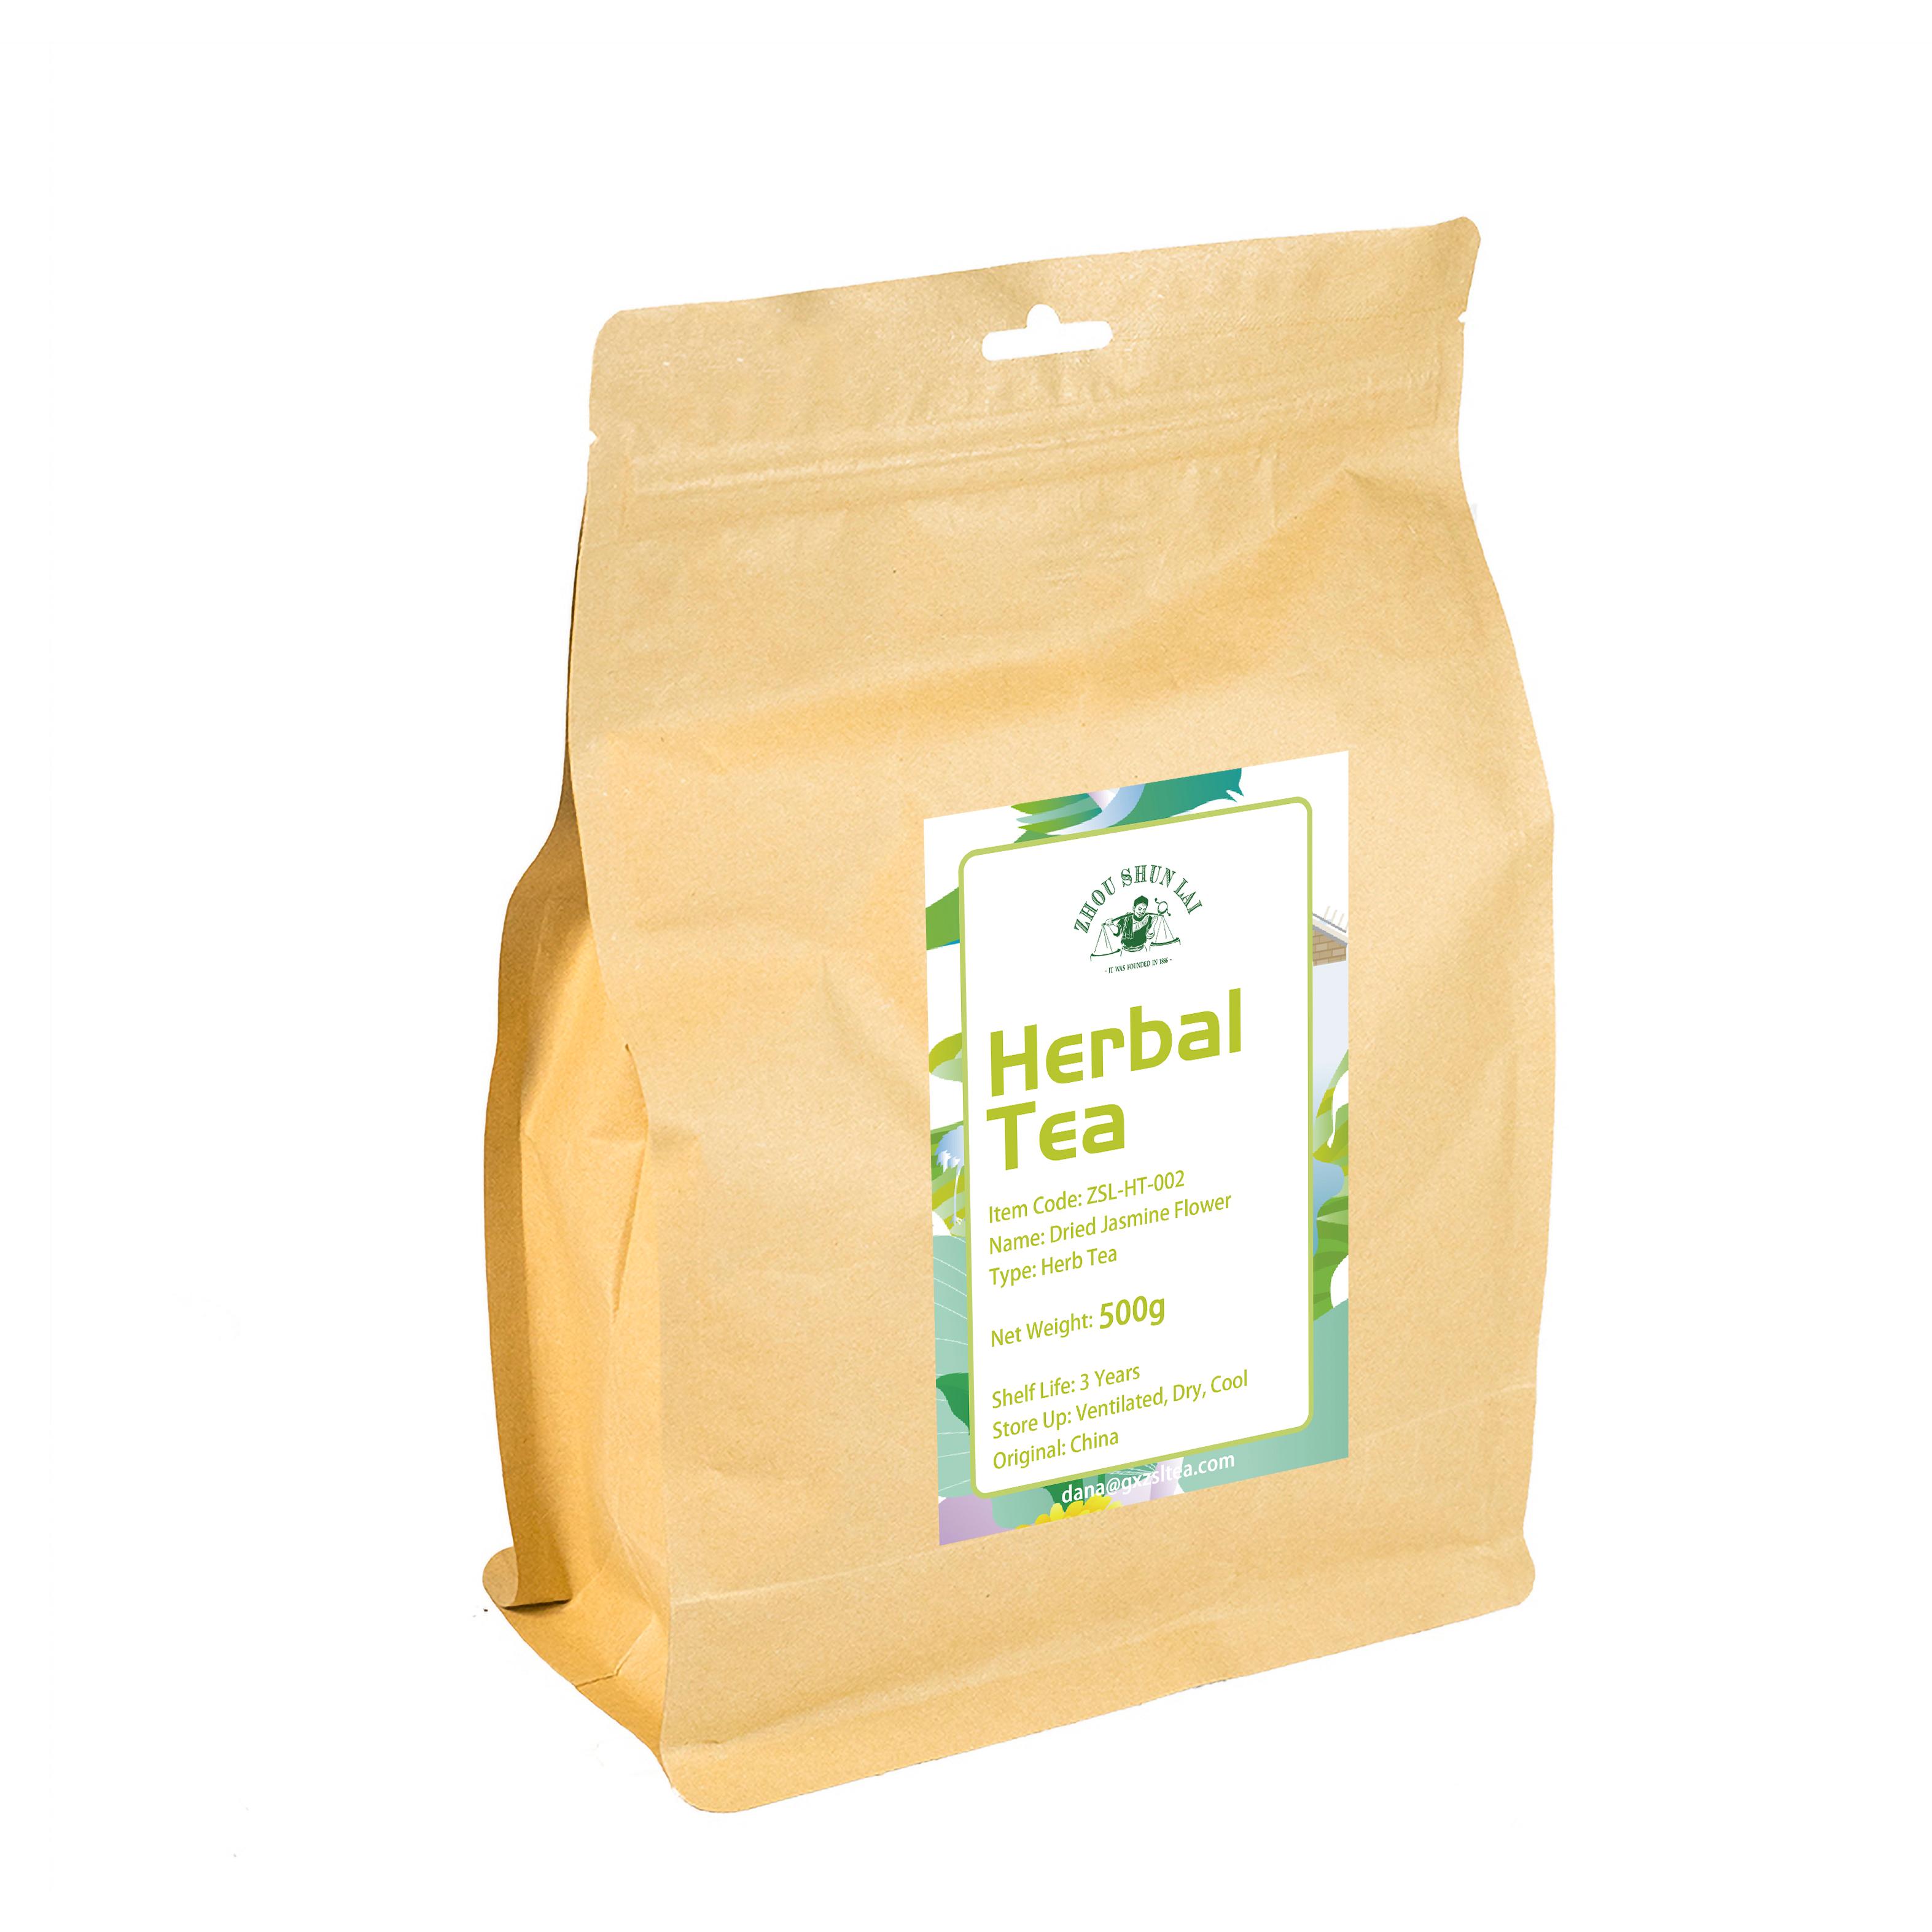 ZS-JB-026M Jasmine Flowers Green Tea Bags Detox Beauty Cold Tea Drinks Foods gift sets green tea jasmine - 4uTea | 4uTea.com